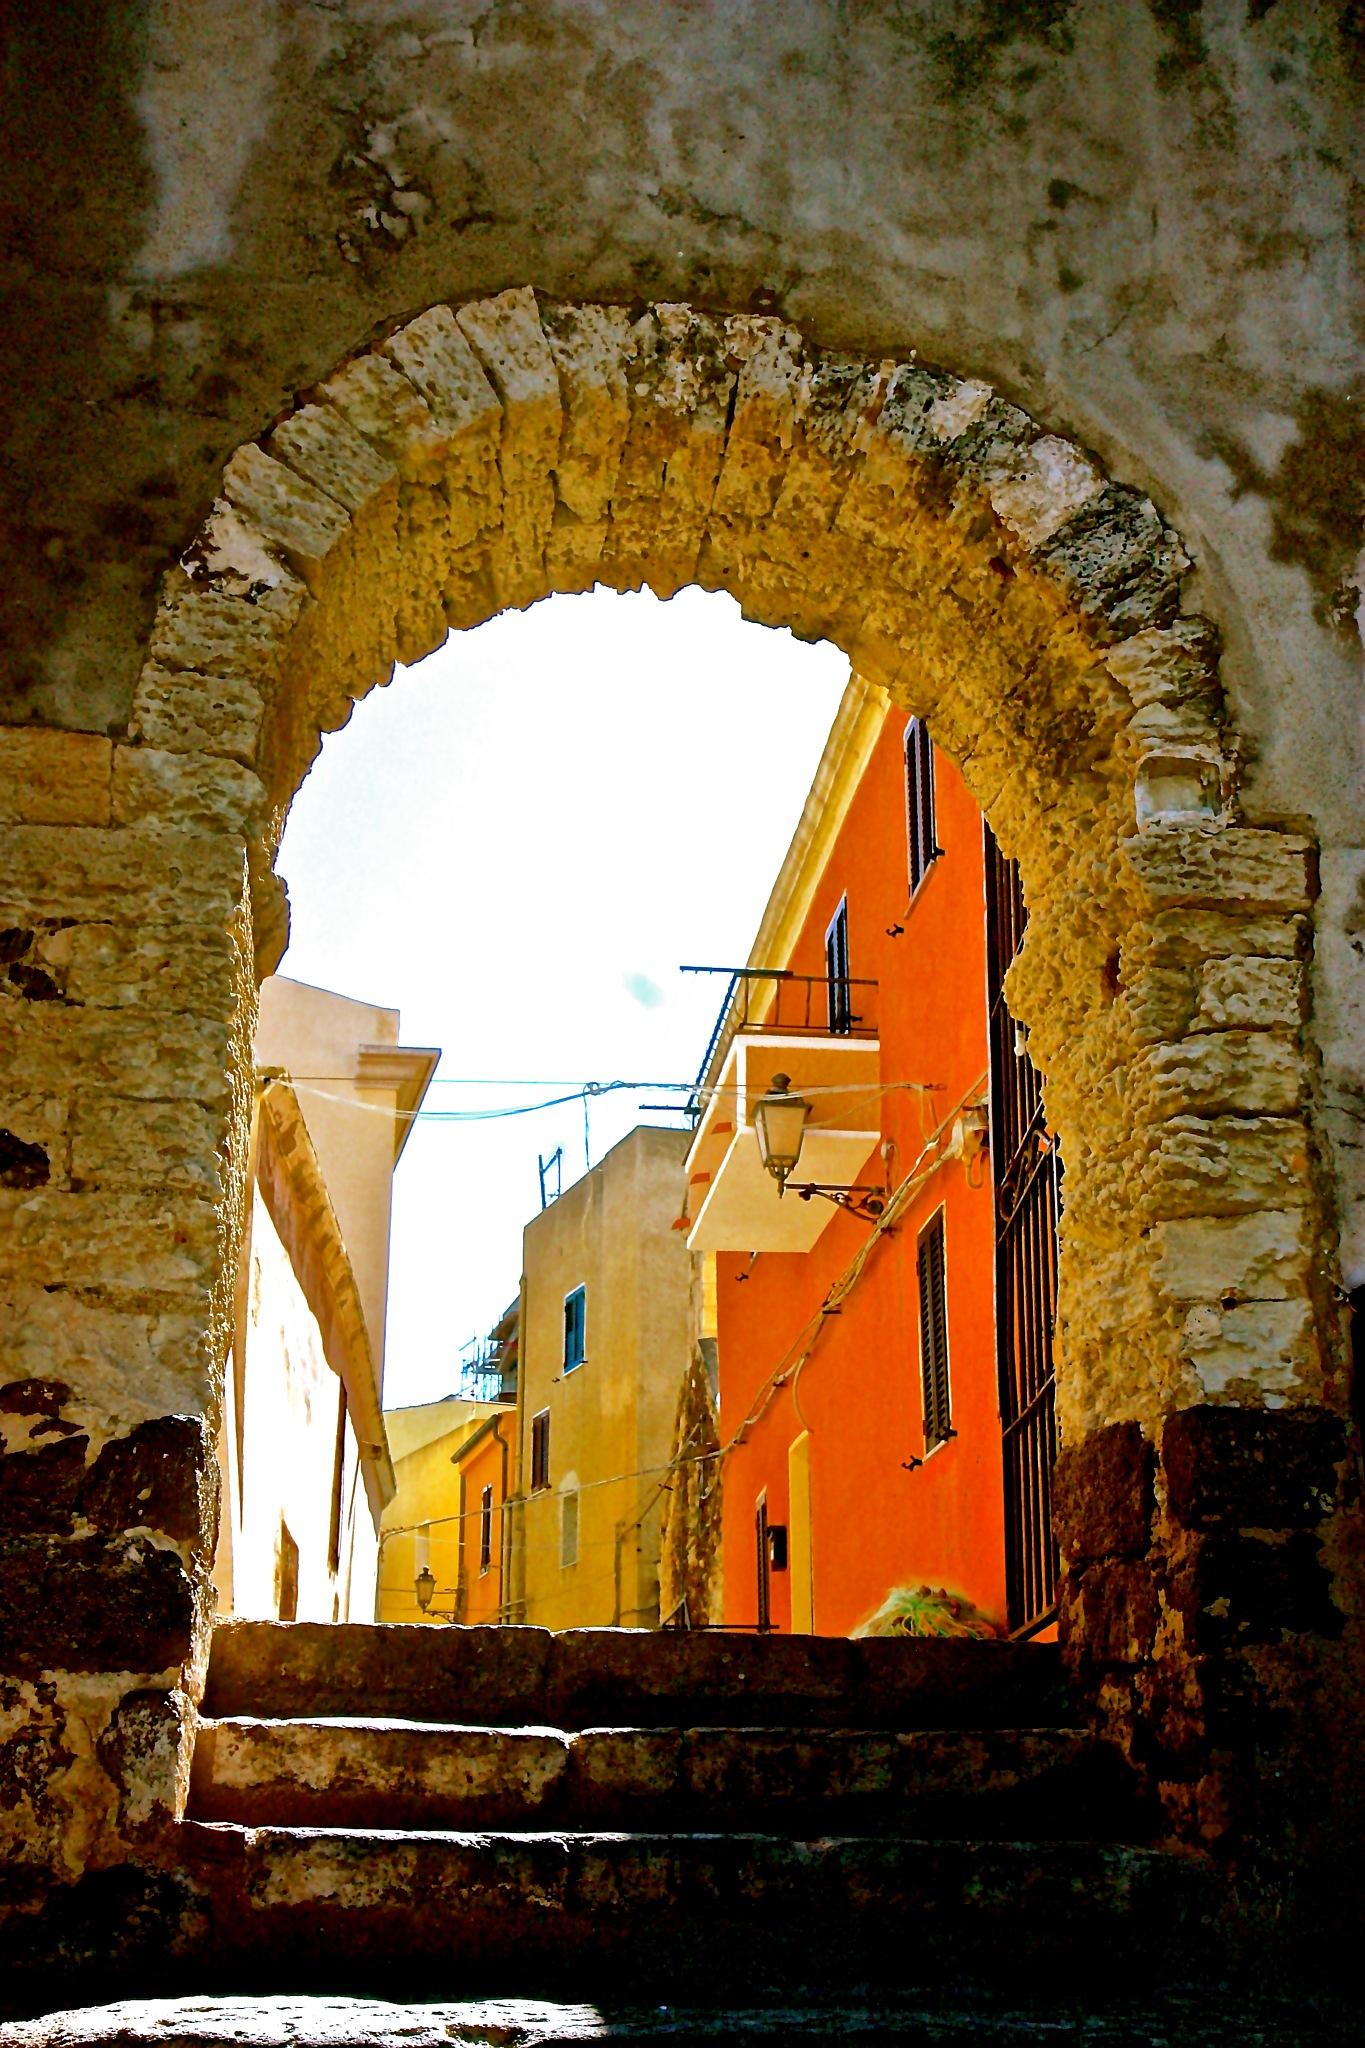 Gateway to history by Steven Thomas Densley